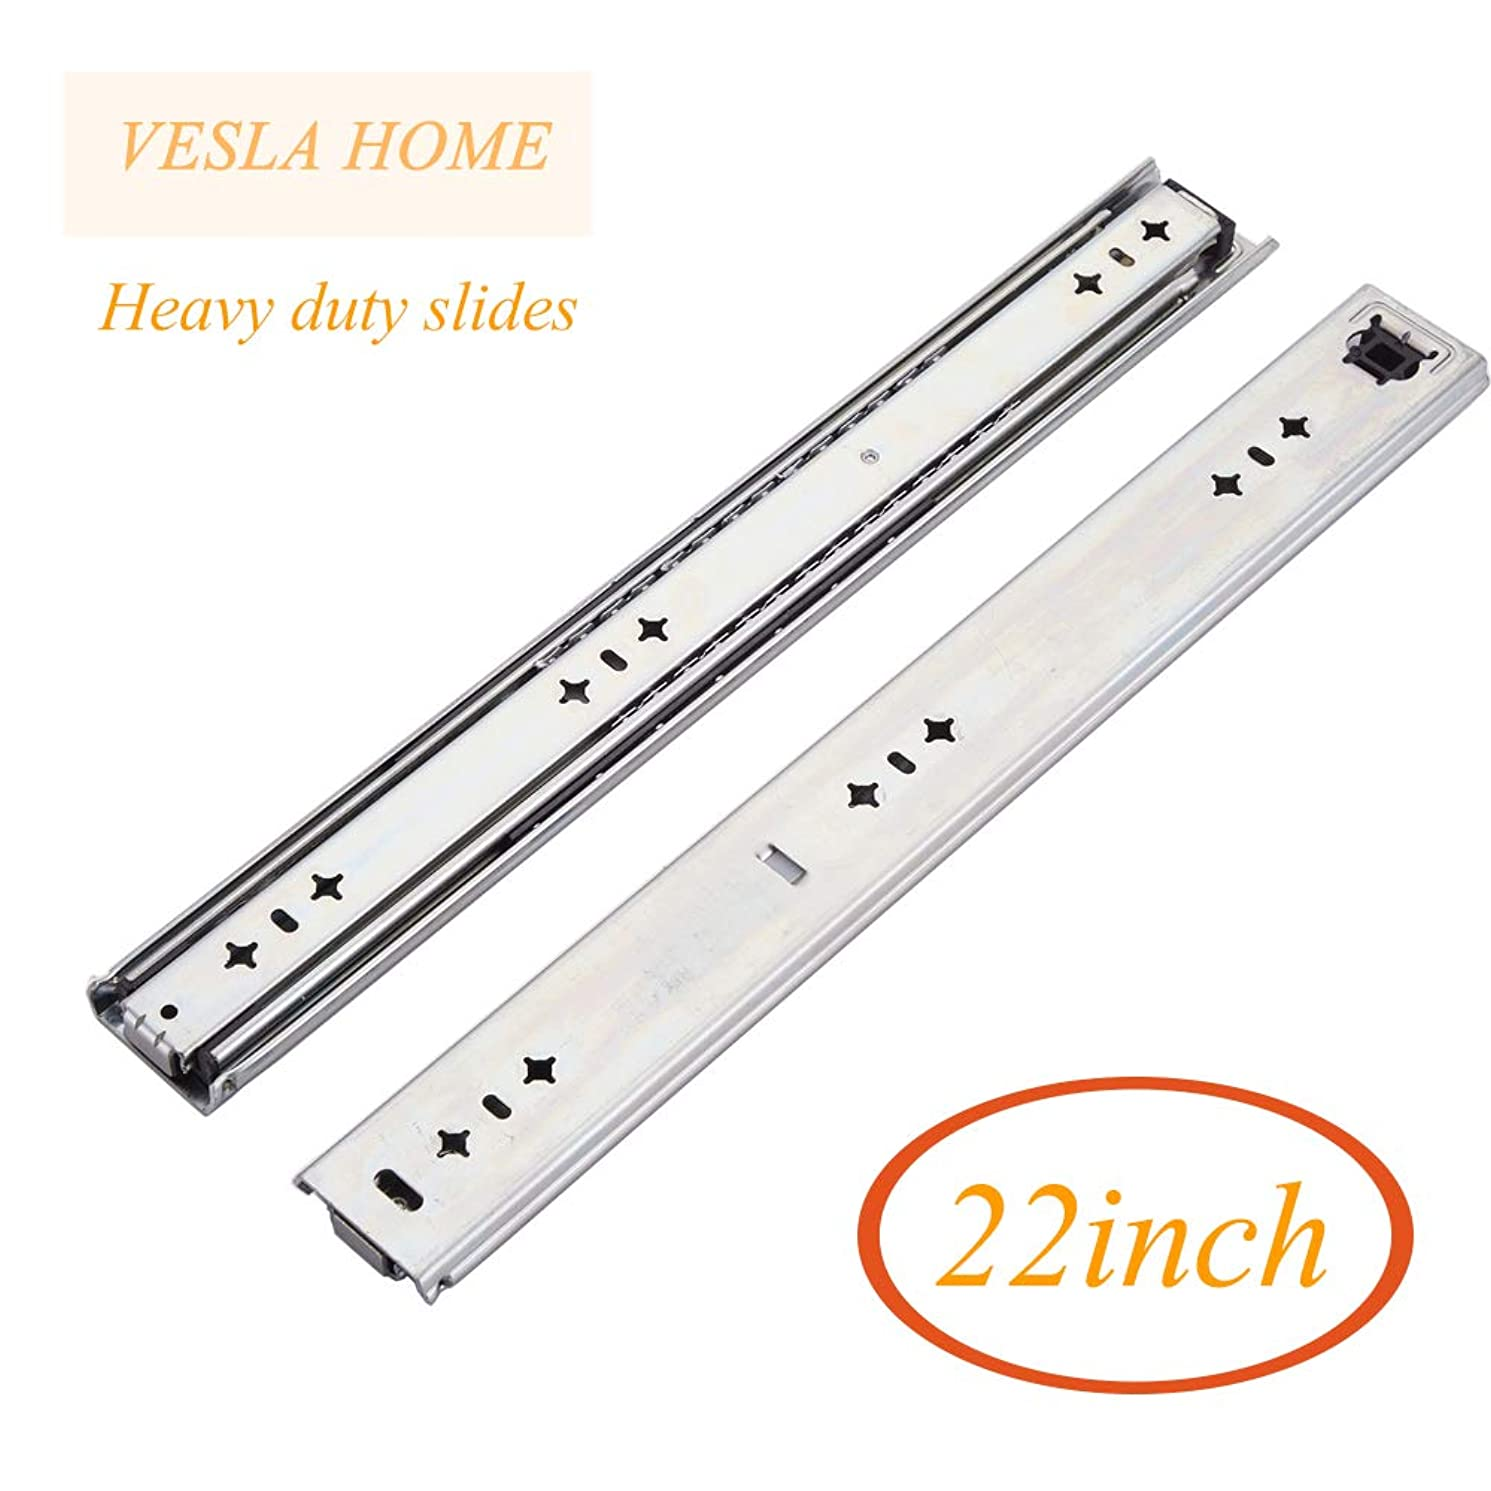 VESLA HOME soft close Hardware Ball Bearing Side Mount Full Extension Drawer Slides,Heavy Duty Slides, 22inch, 210 lb